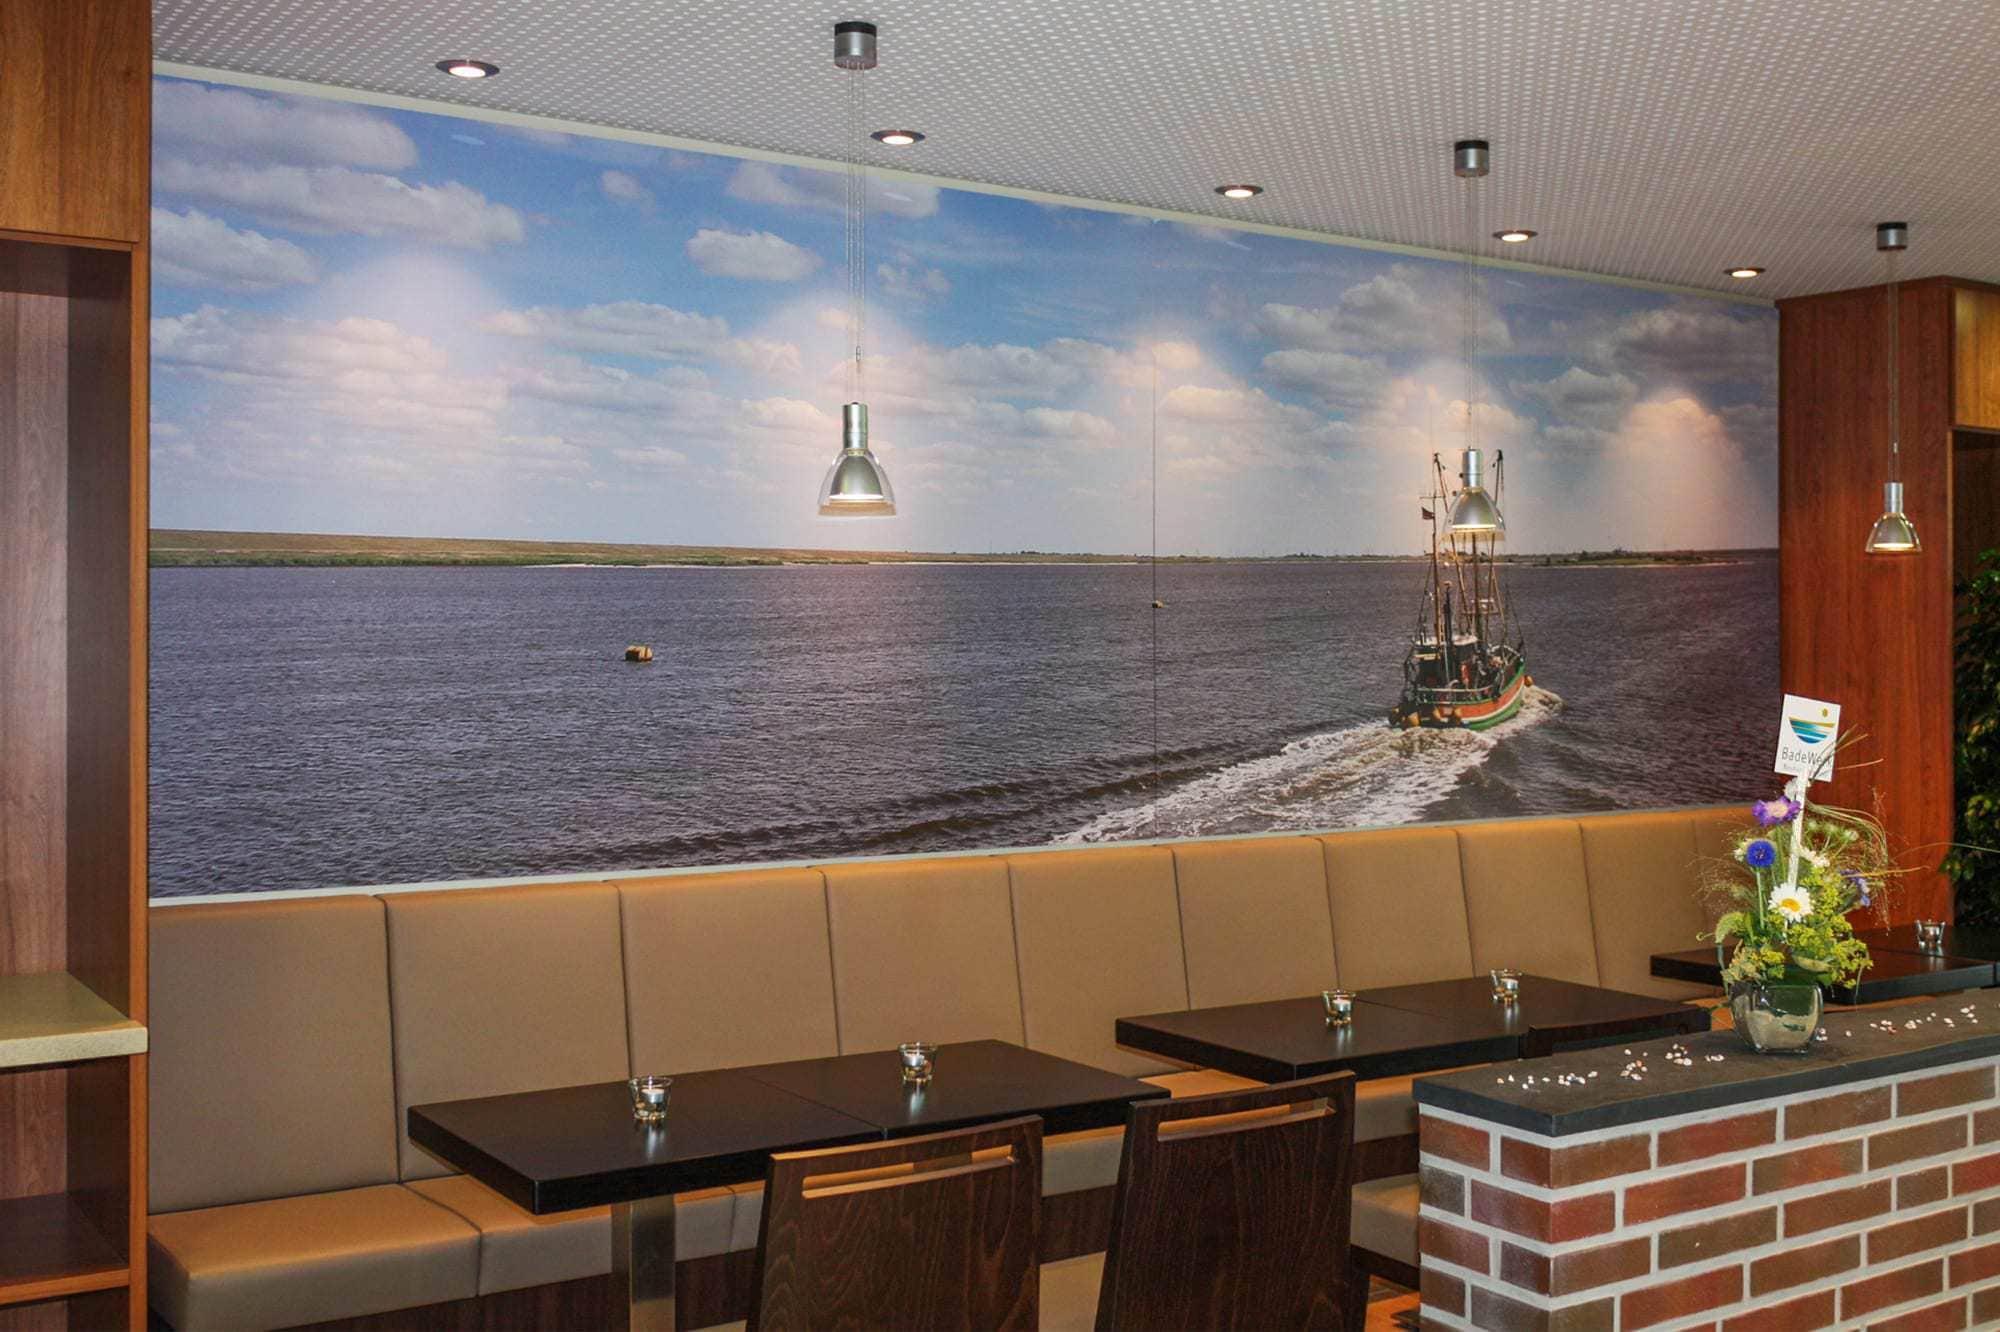 Foto gedruckt auf Aludibondplatten als Wandbild in einem Hamburger Restaurant